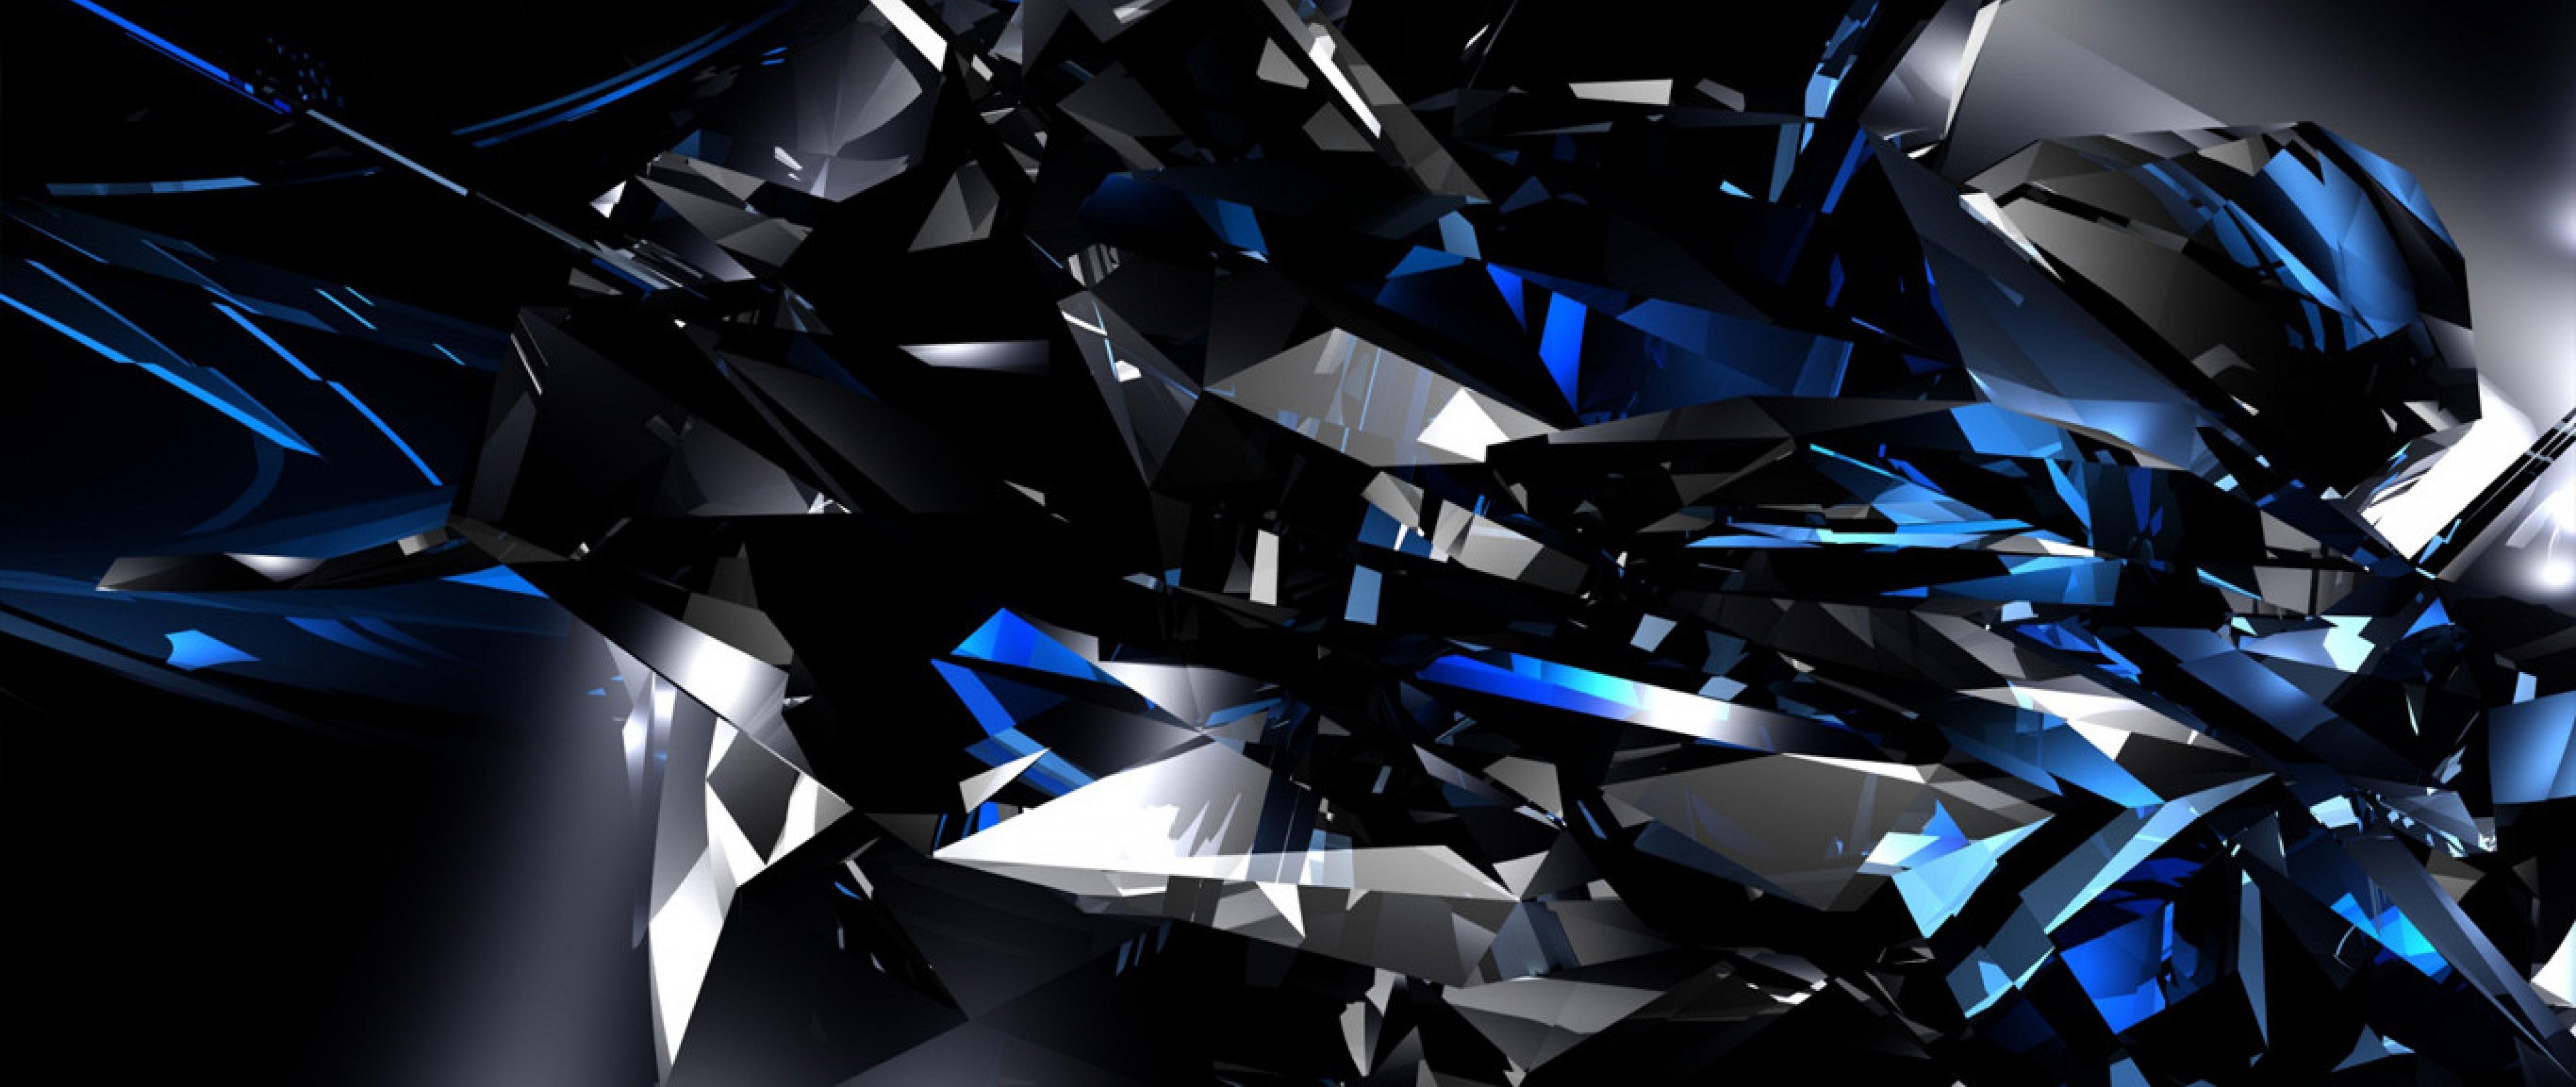 Crystal Lake - Black And Blue HD Wallpaper 4K Ultra HD ...